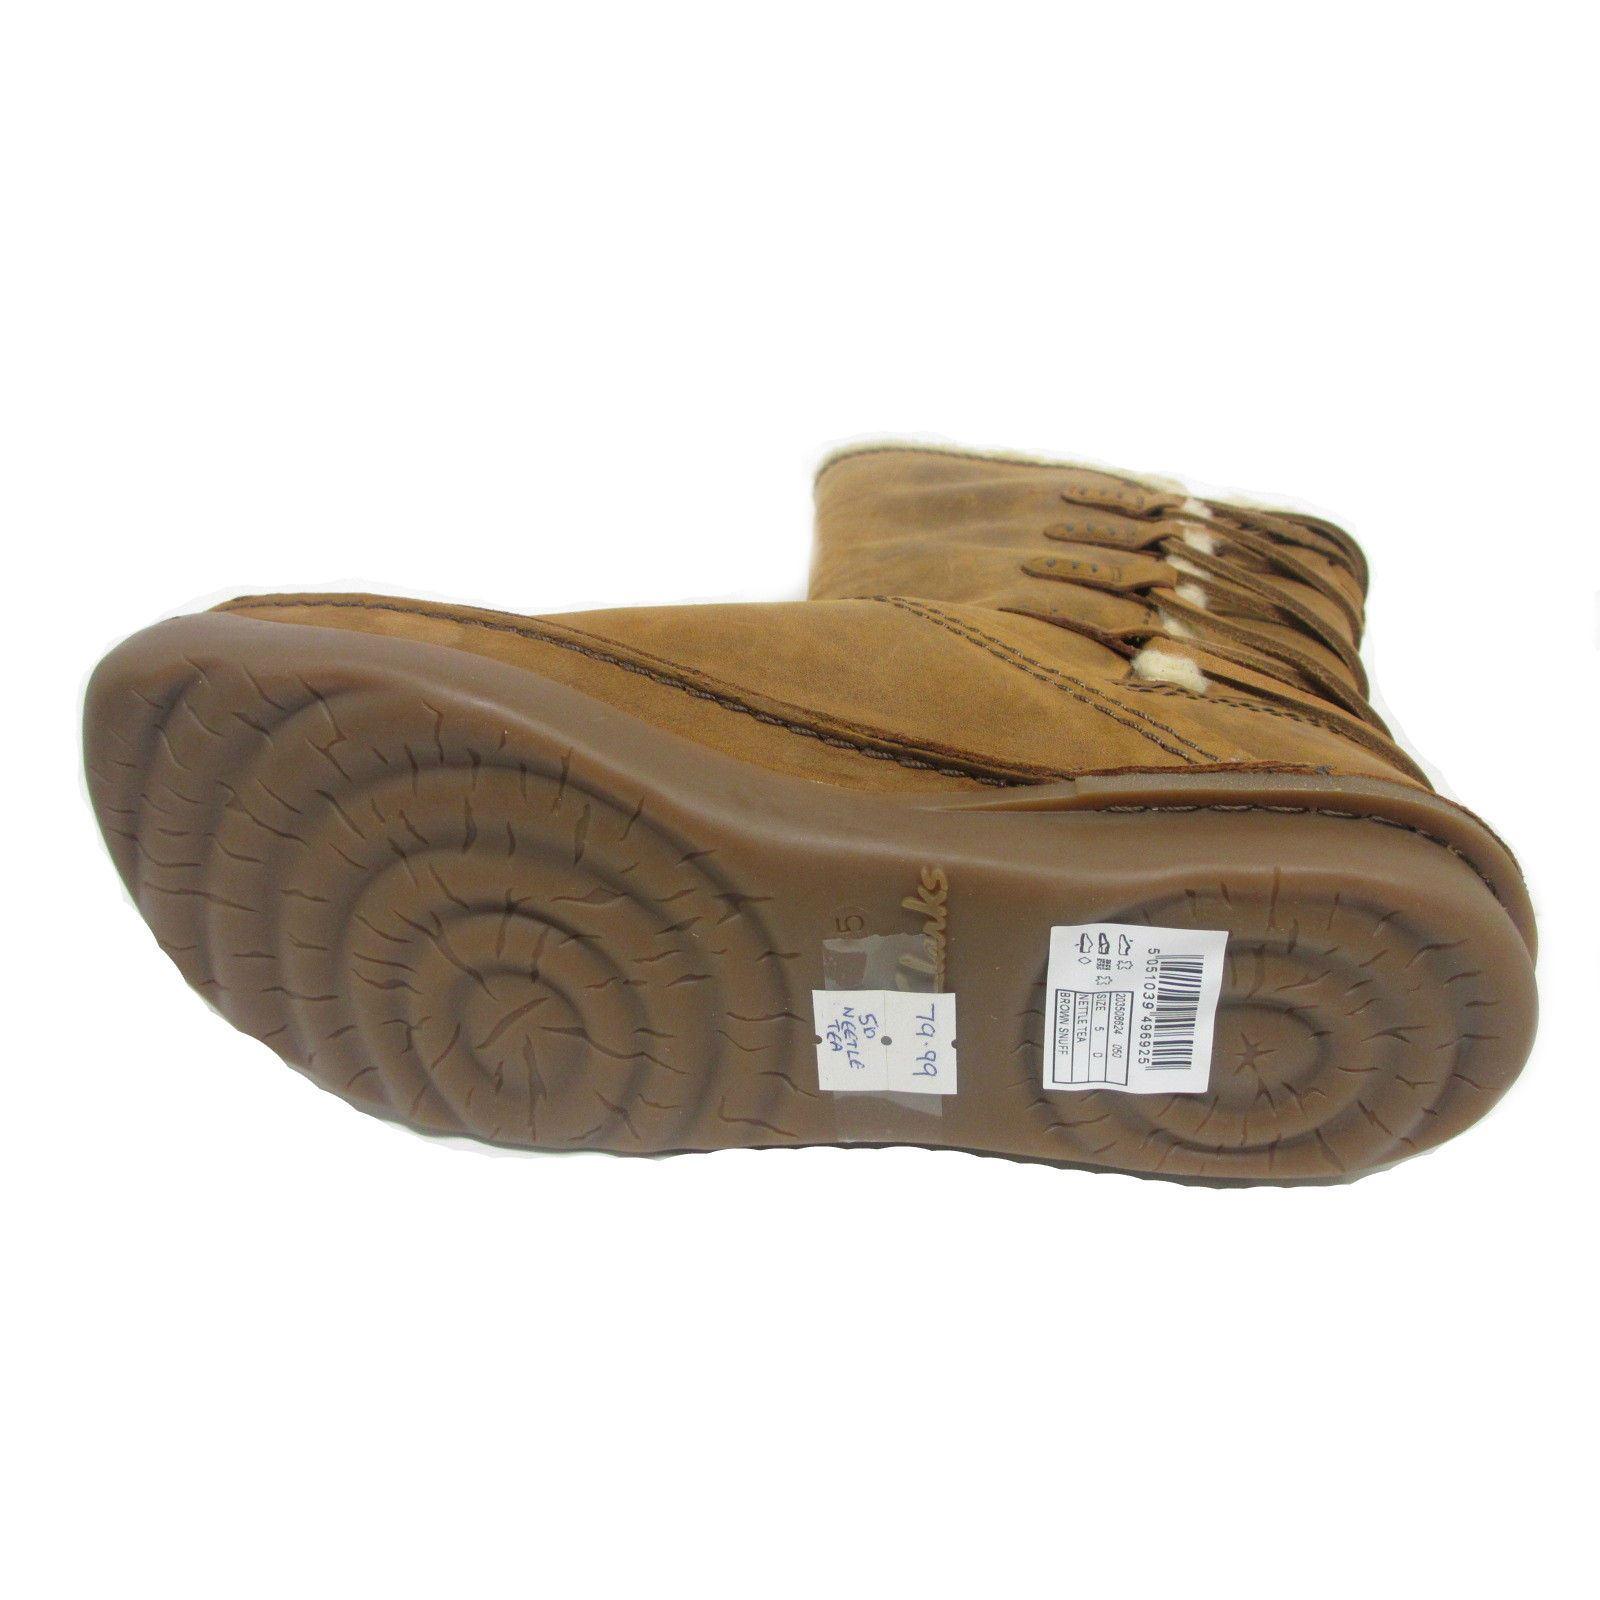 Boots Casual Clarks Nettle Mid Snuff Tea Brown Calf Flat Ladies vqXw6X